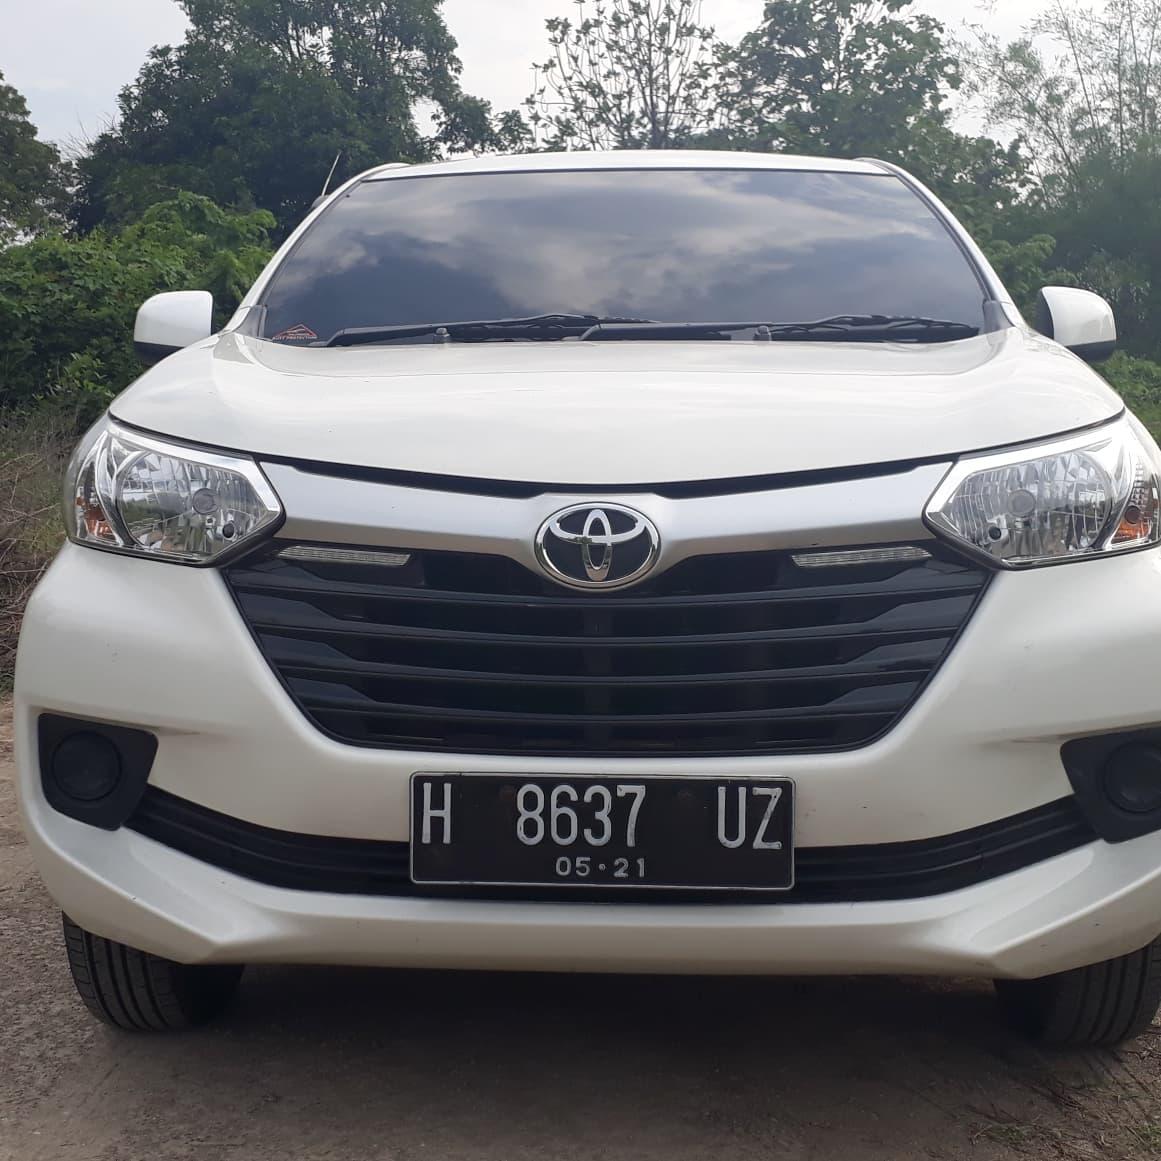 grand new avanza e 2016 all kijang innova 2.4 q a/t diesel venturer jual tipe manual ardiejaya tokopedia 363768 2c7ae882 bd01 4ef7 9a0b 498f1bf4bbf4 1161 jpg